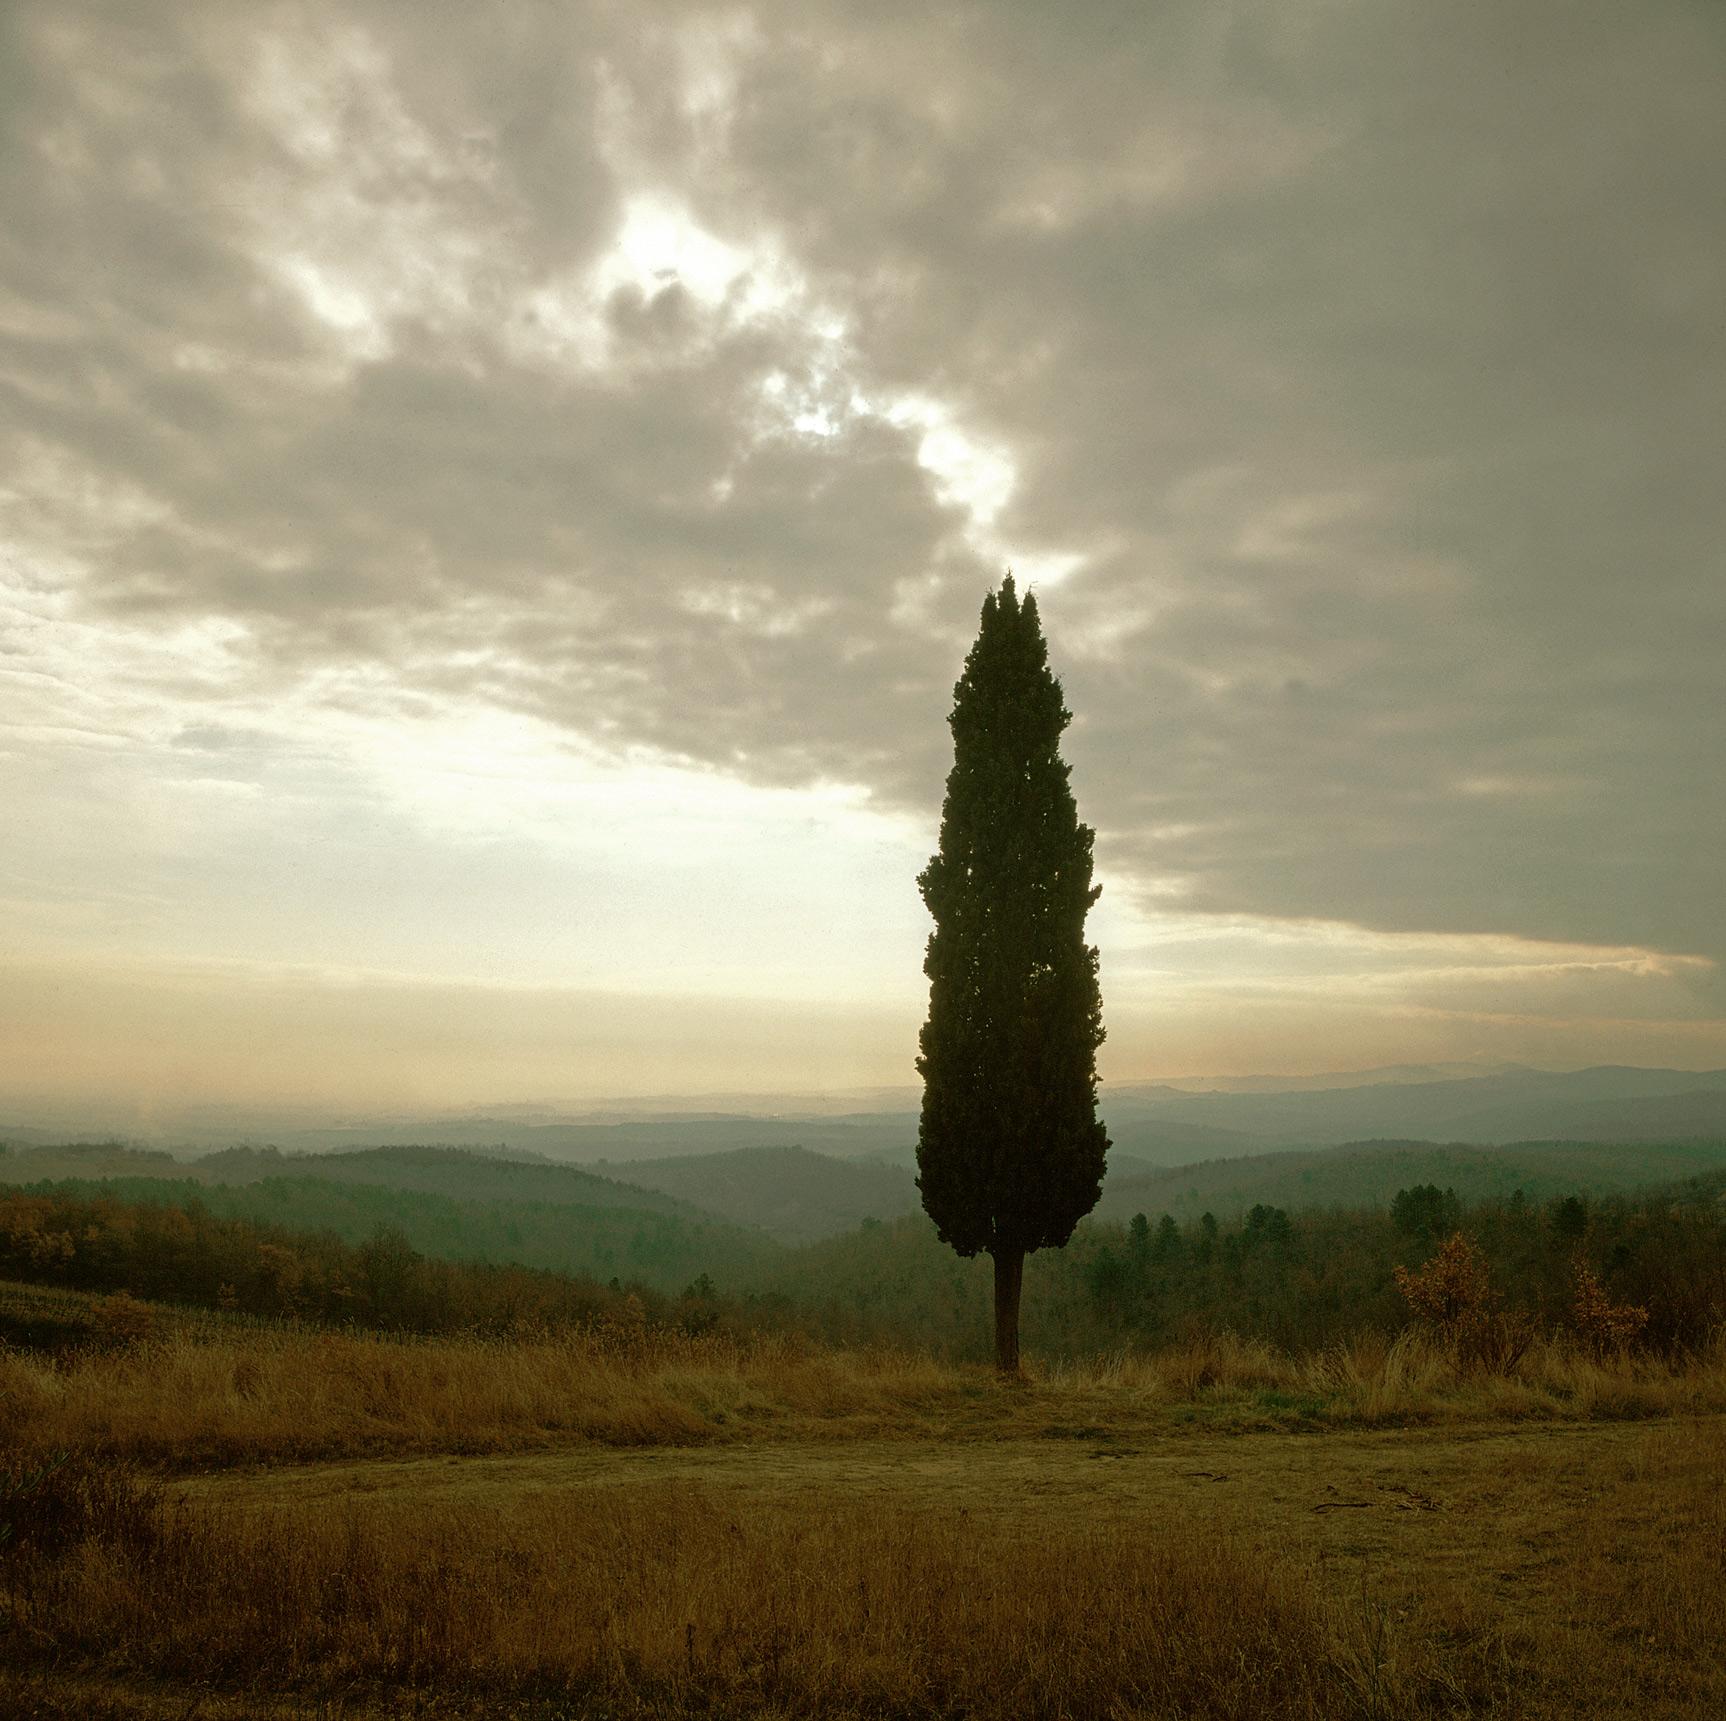 Sinalunga, Tuscany, Italy (030015)